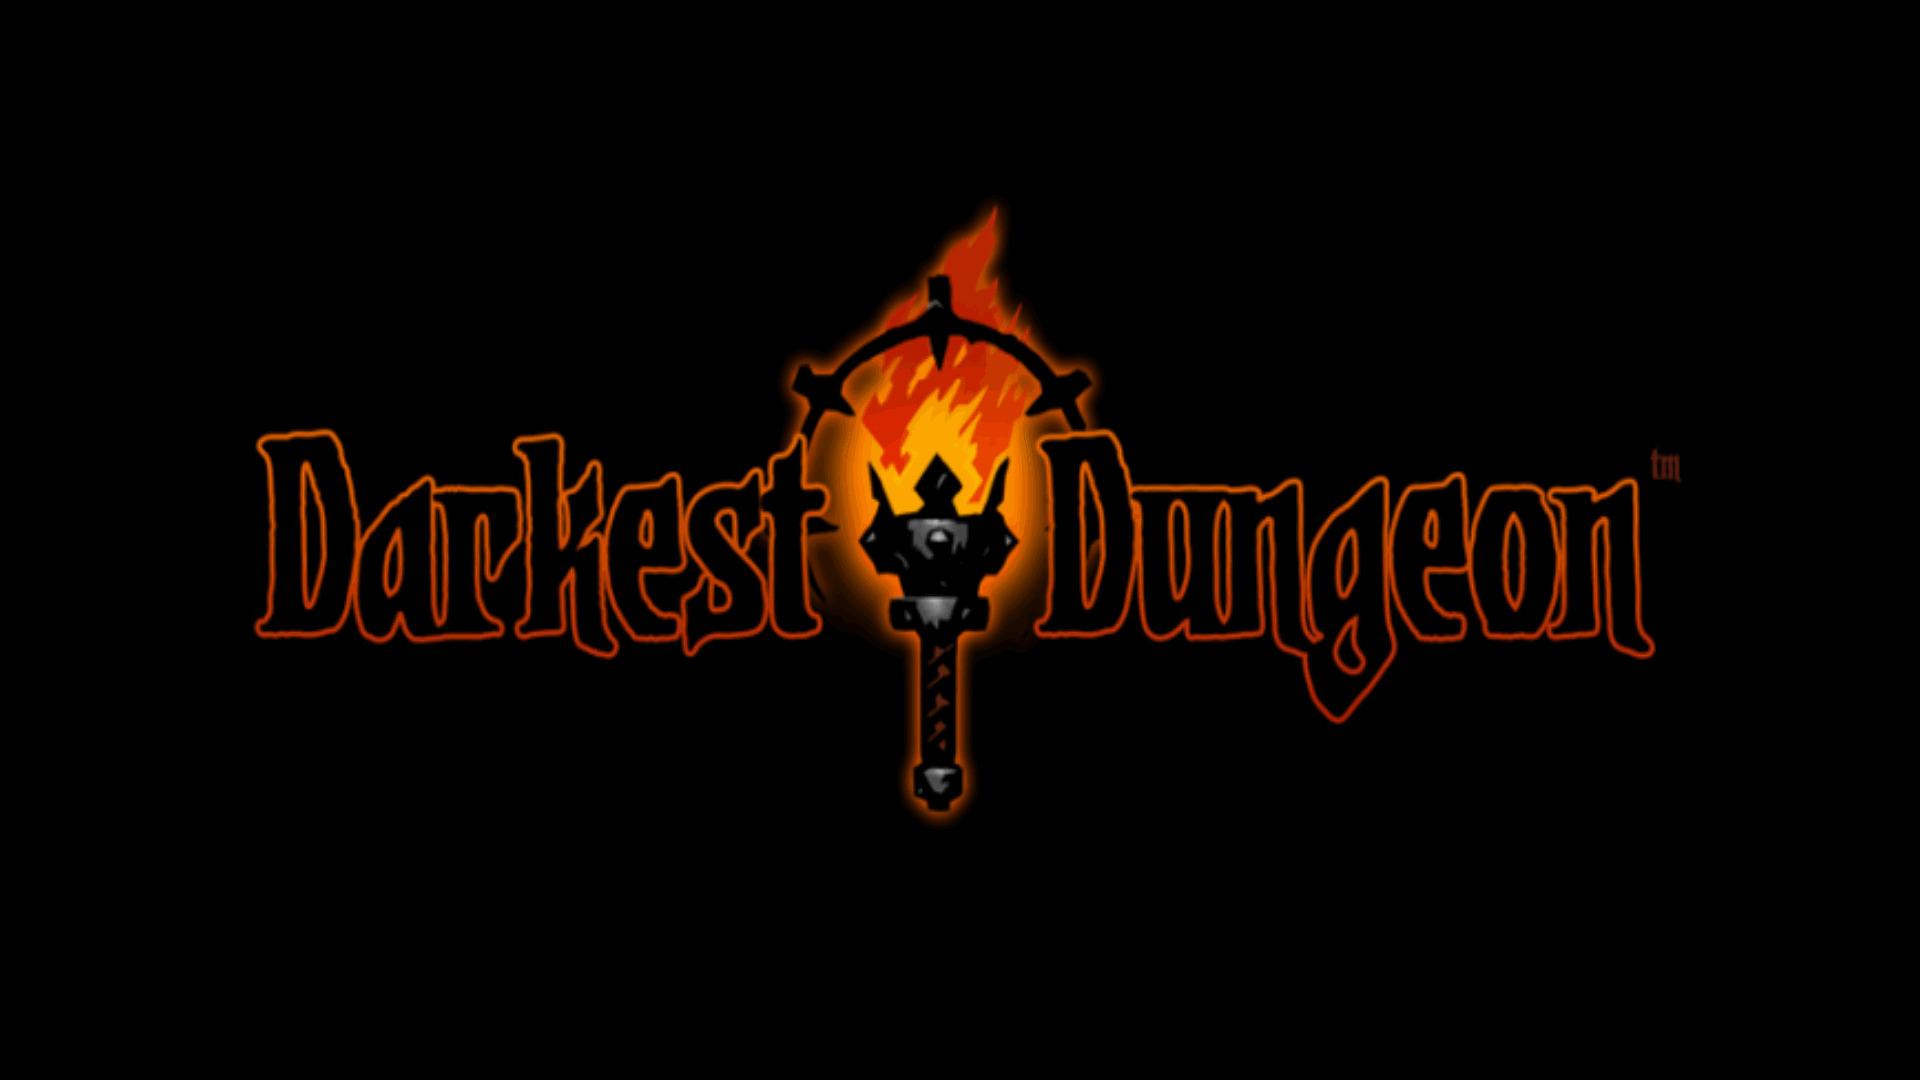 Download Map Darkest Dungeon Orpg Role Play Game Rpg 11